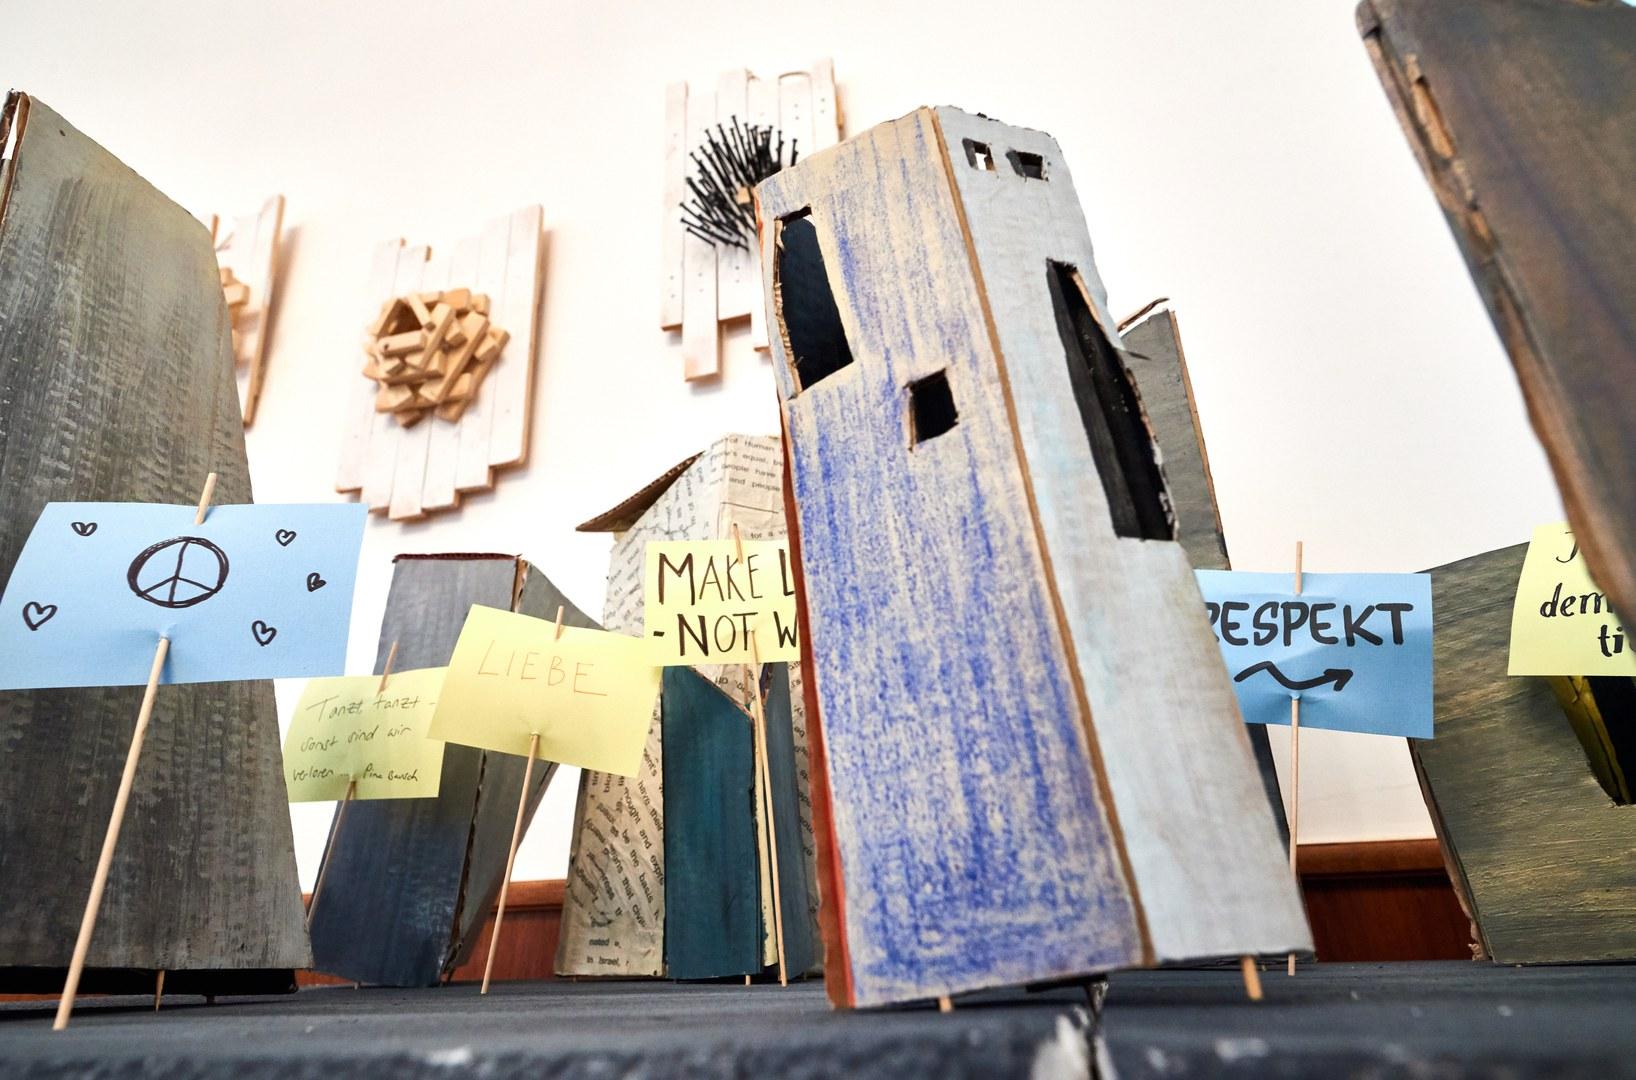 Der interaktive Demonstrationszug im Universitätsmuseum.